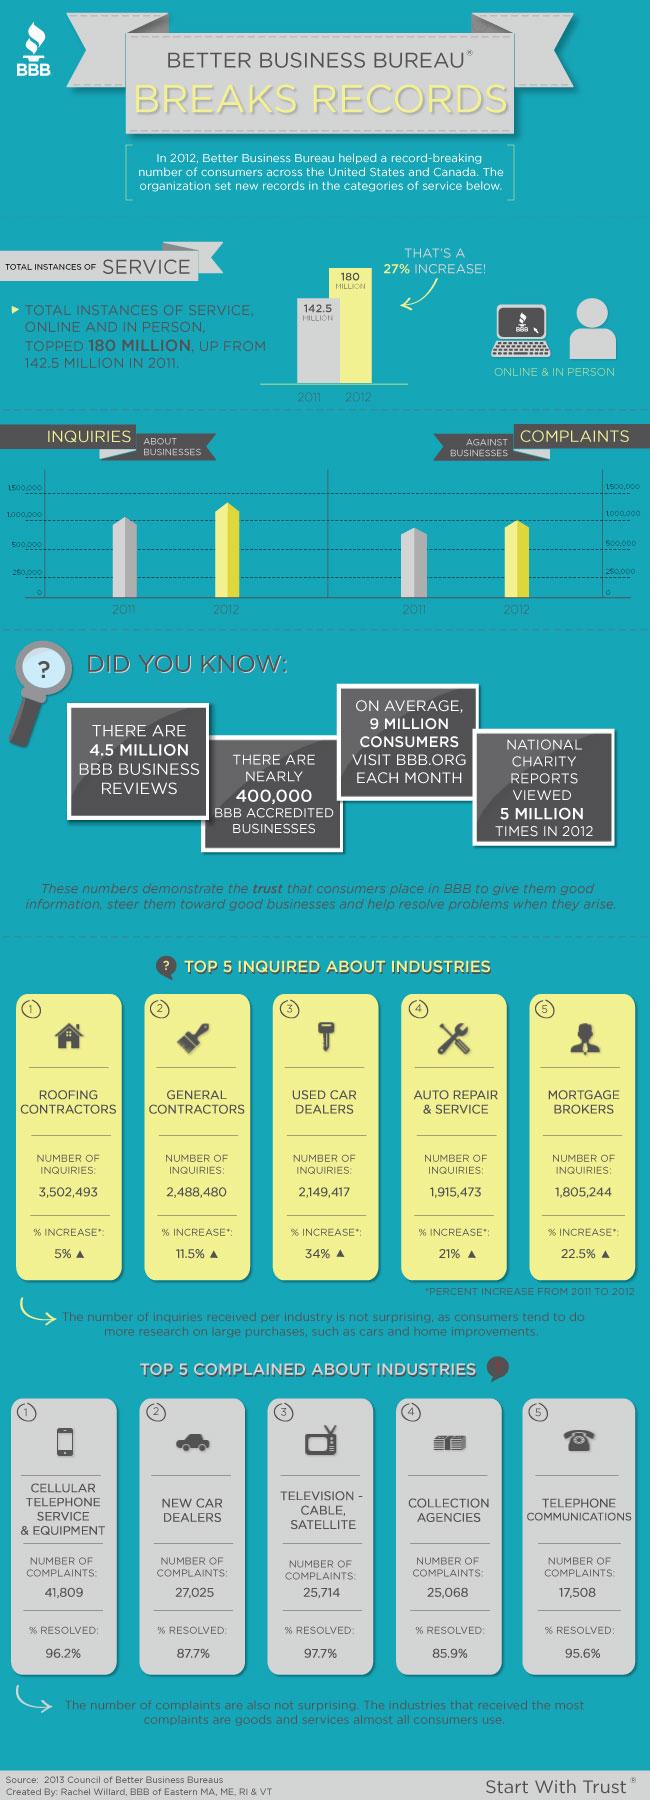 bbb-breaks-records-infographic